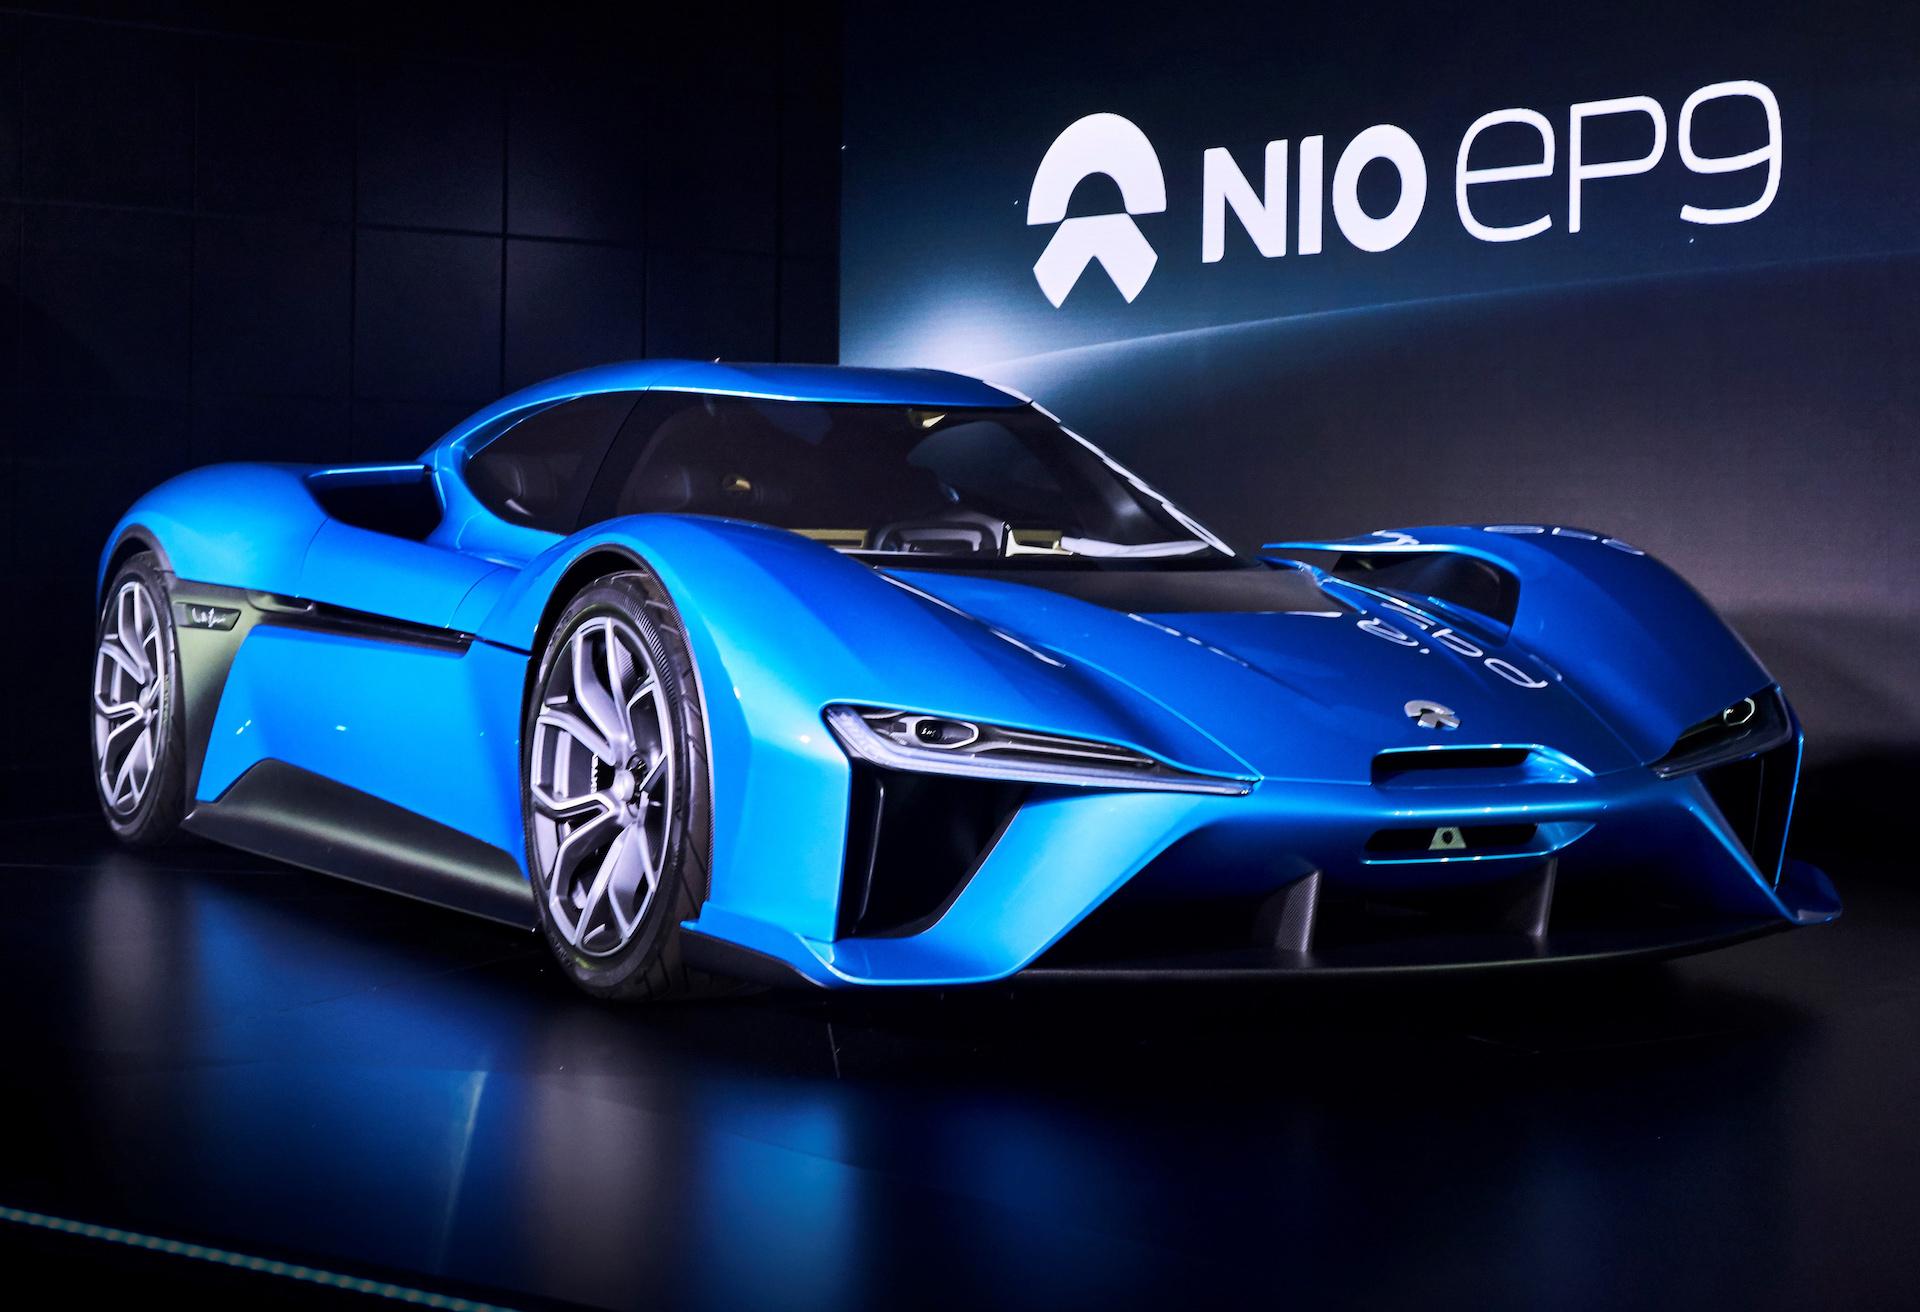 nio_ep9_electric_supercar_5k-HD